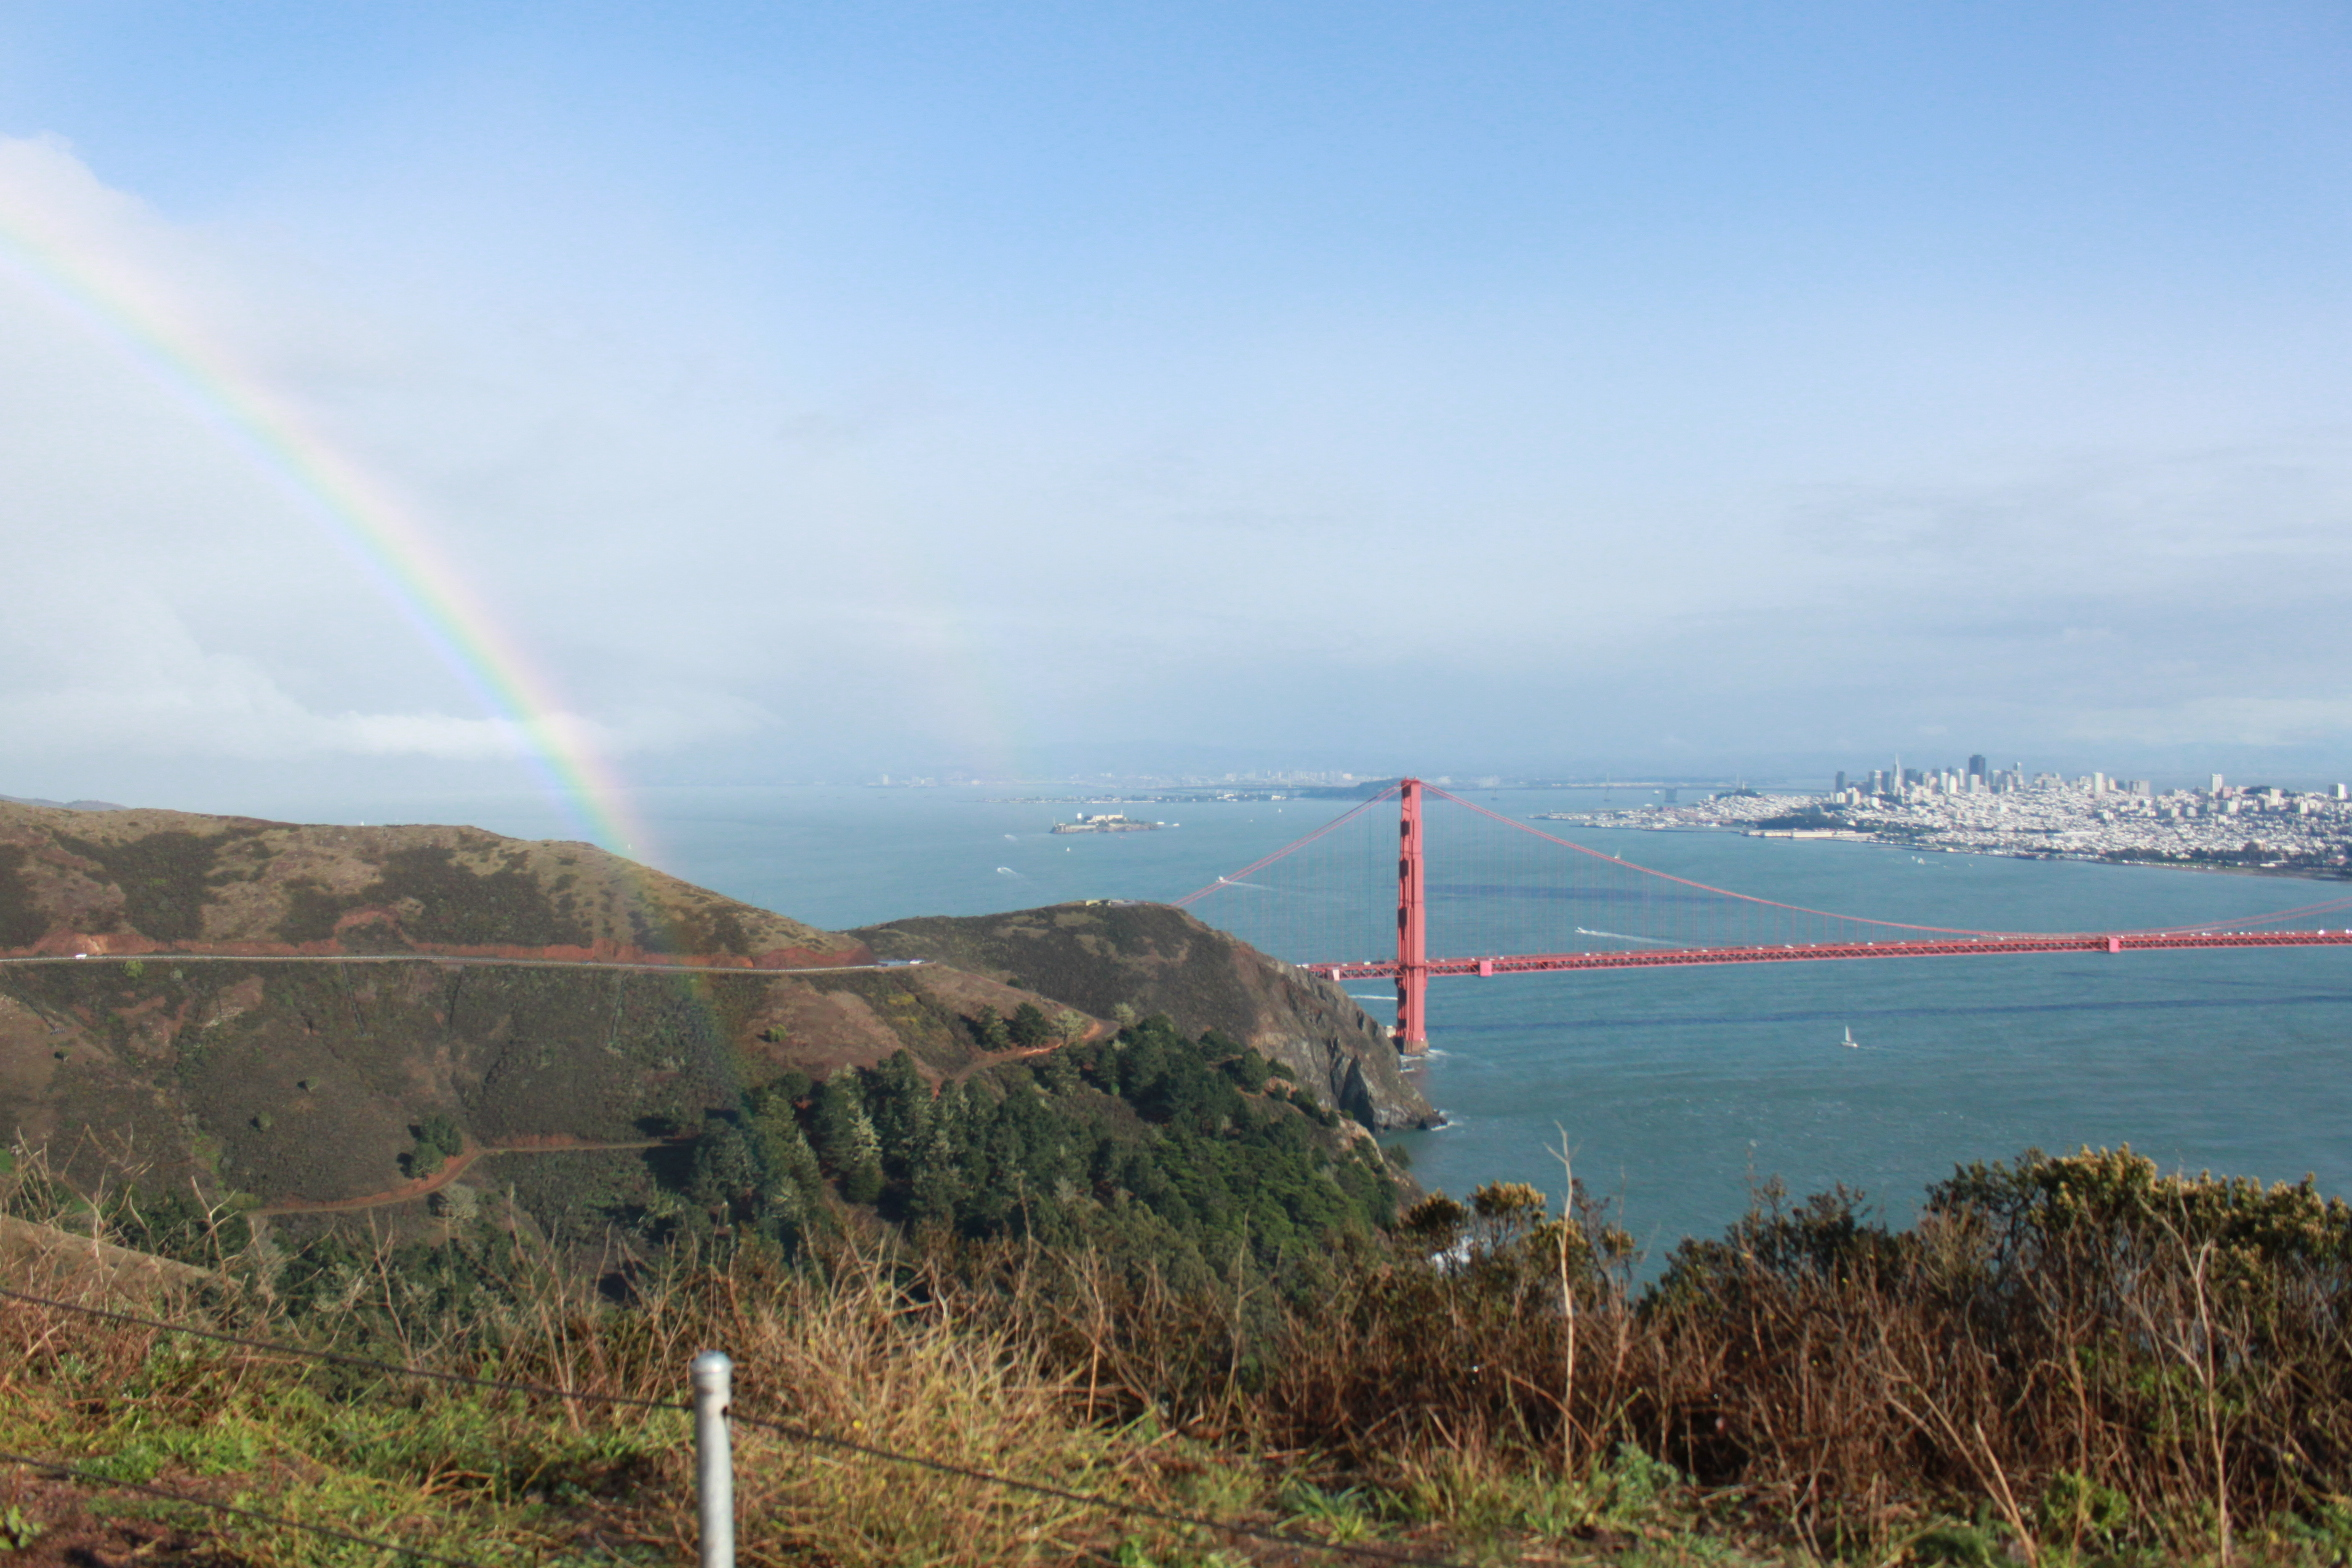 San Francisco in summer, a rainbow visible, California